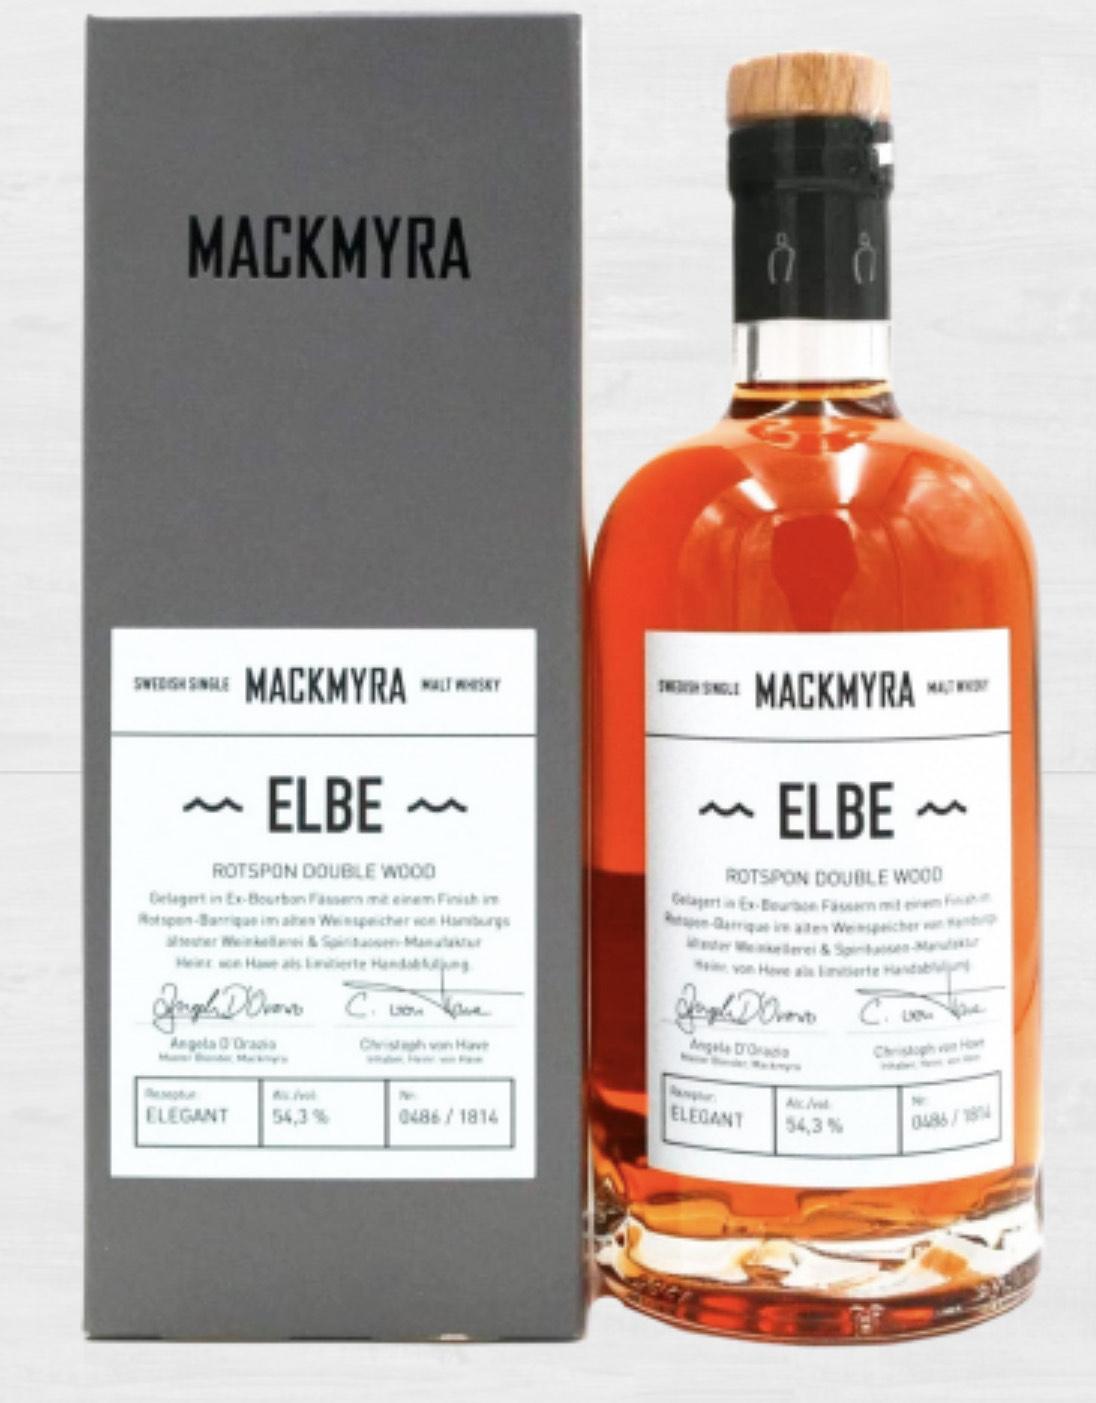 Mackmyra Elbe Single Malt Whisky 54,3%/ 0,5l